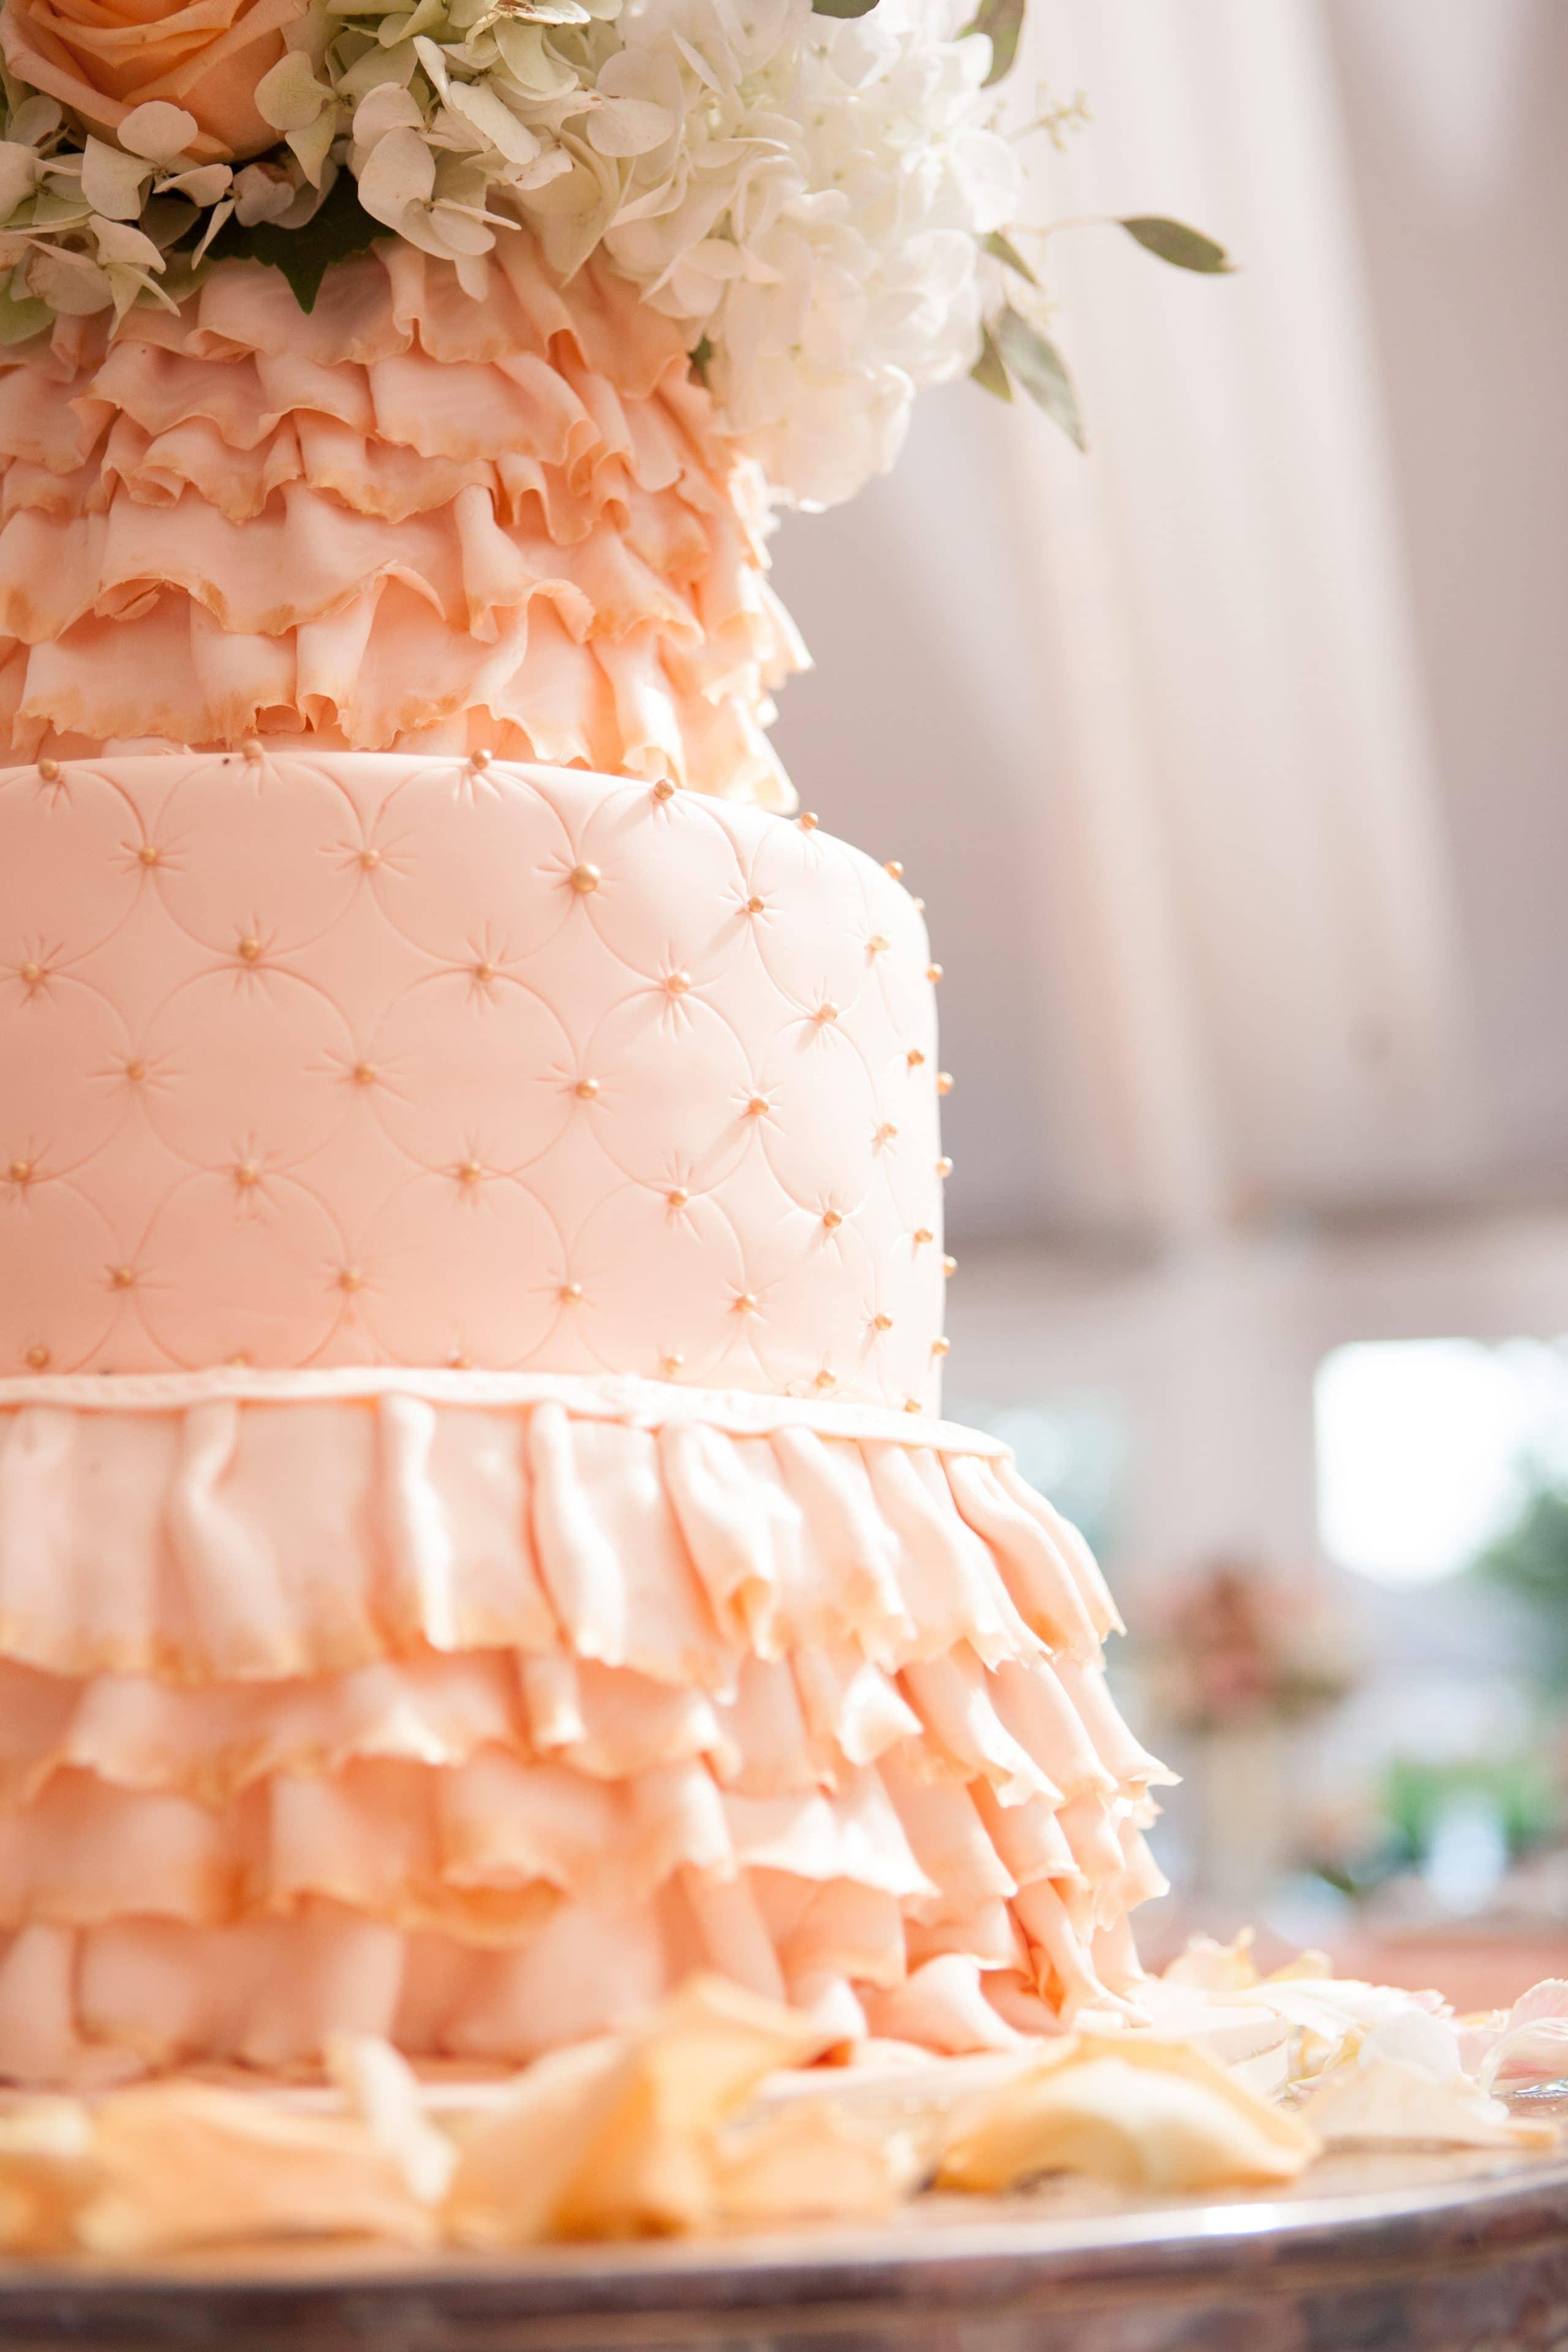 Cake - Simon Lee Bakery